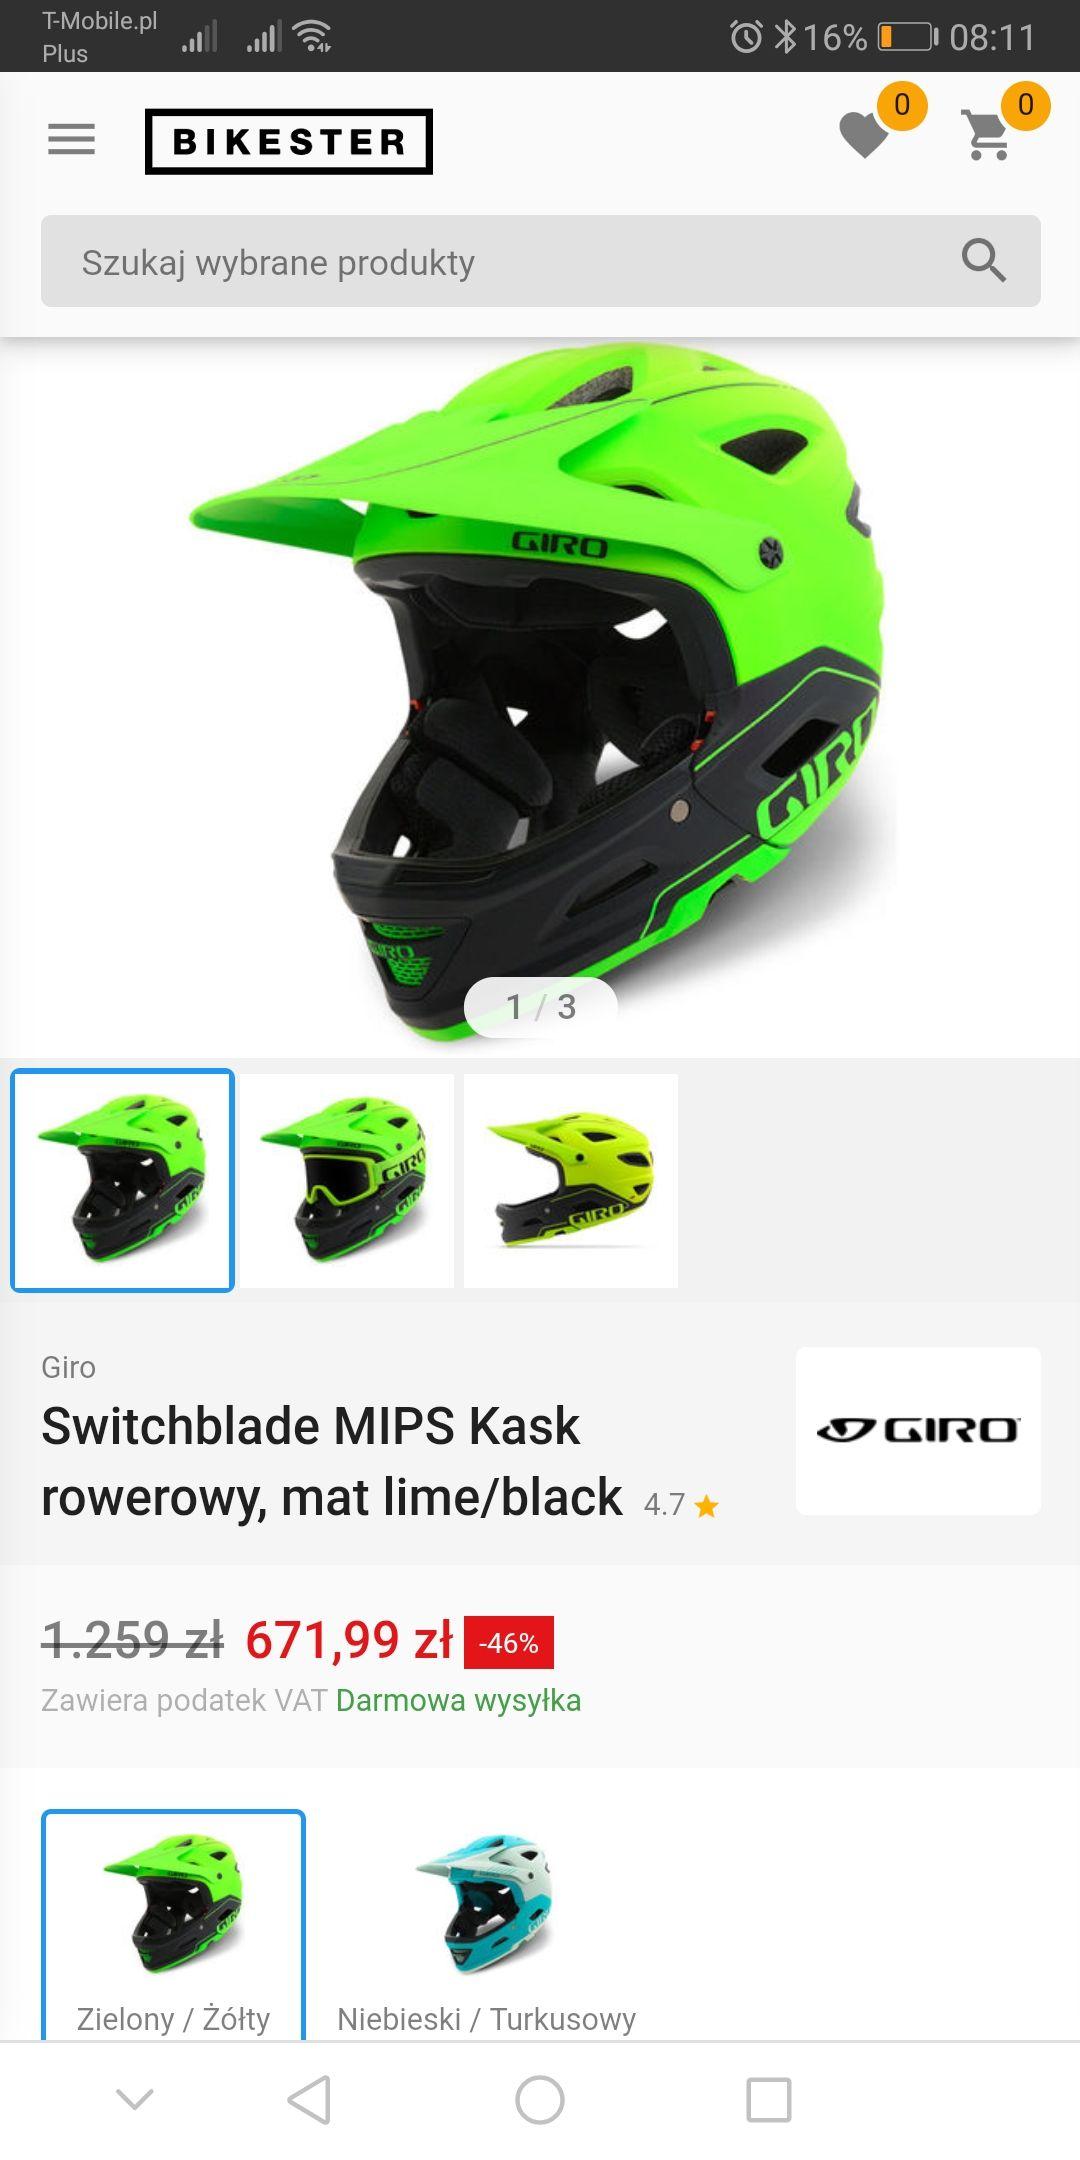 Kask enduro/fr Giro Switchblade Mips 2 w 1